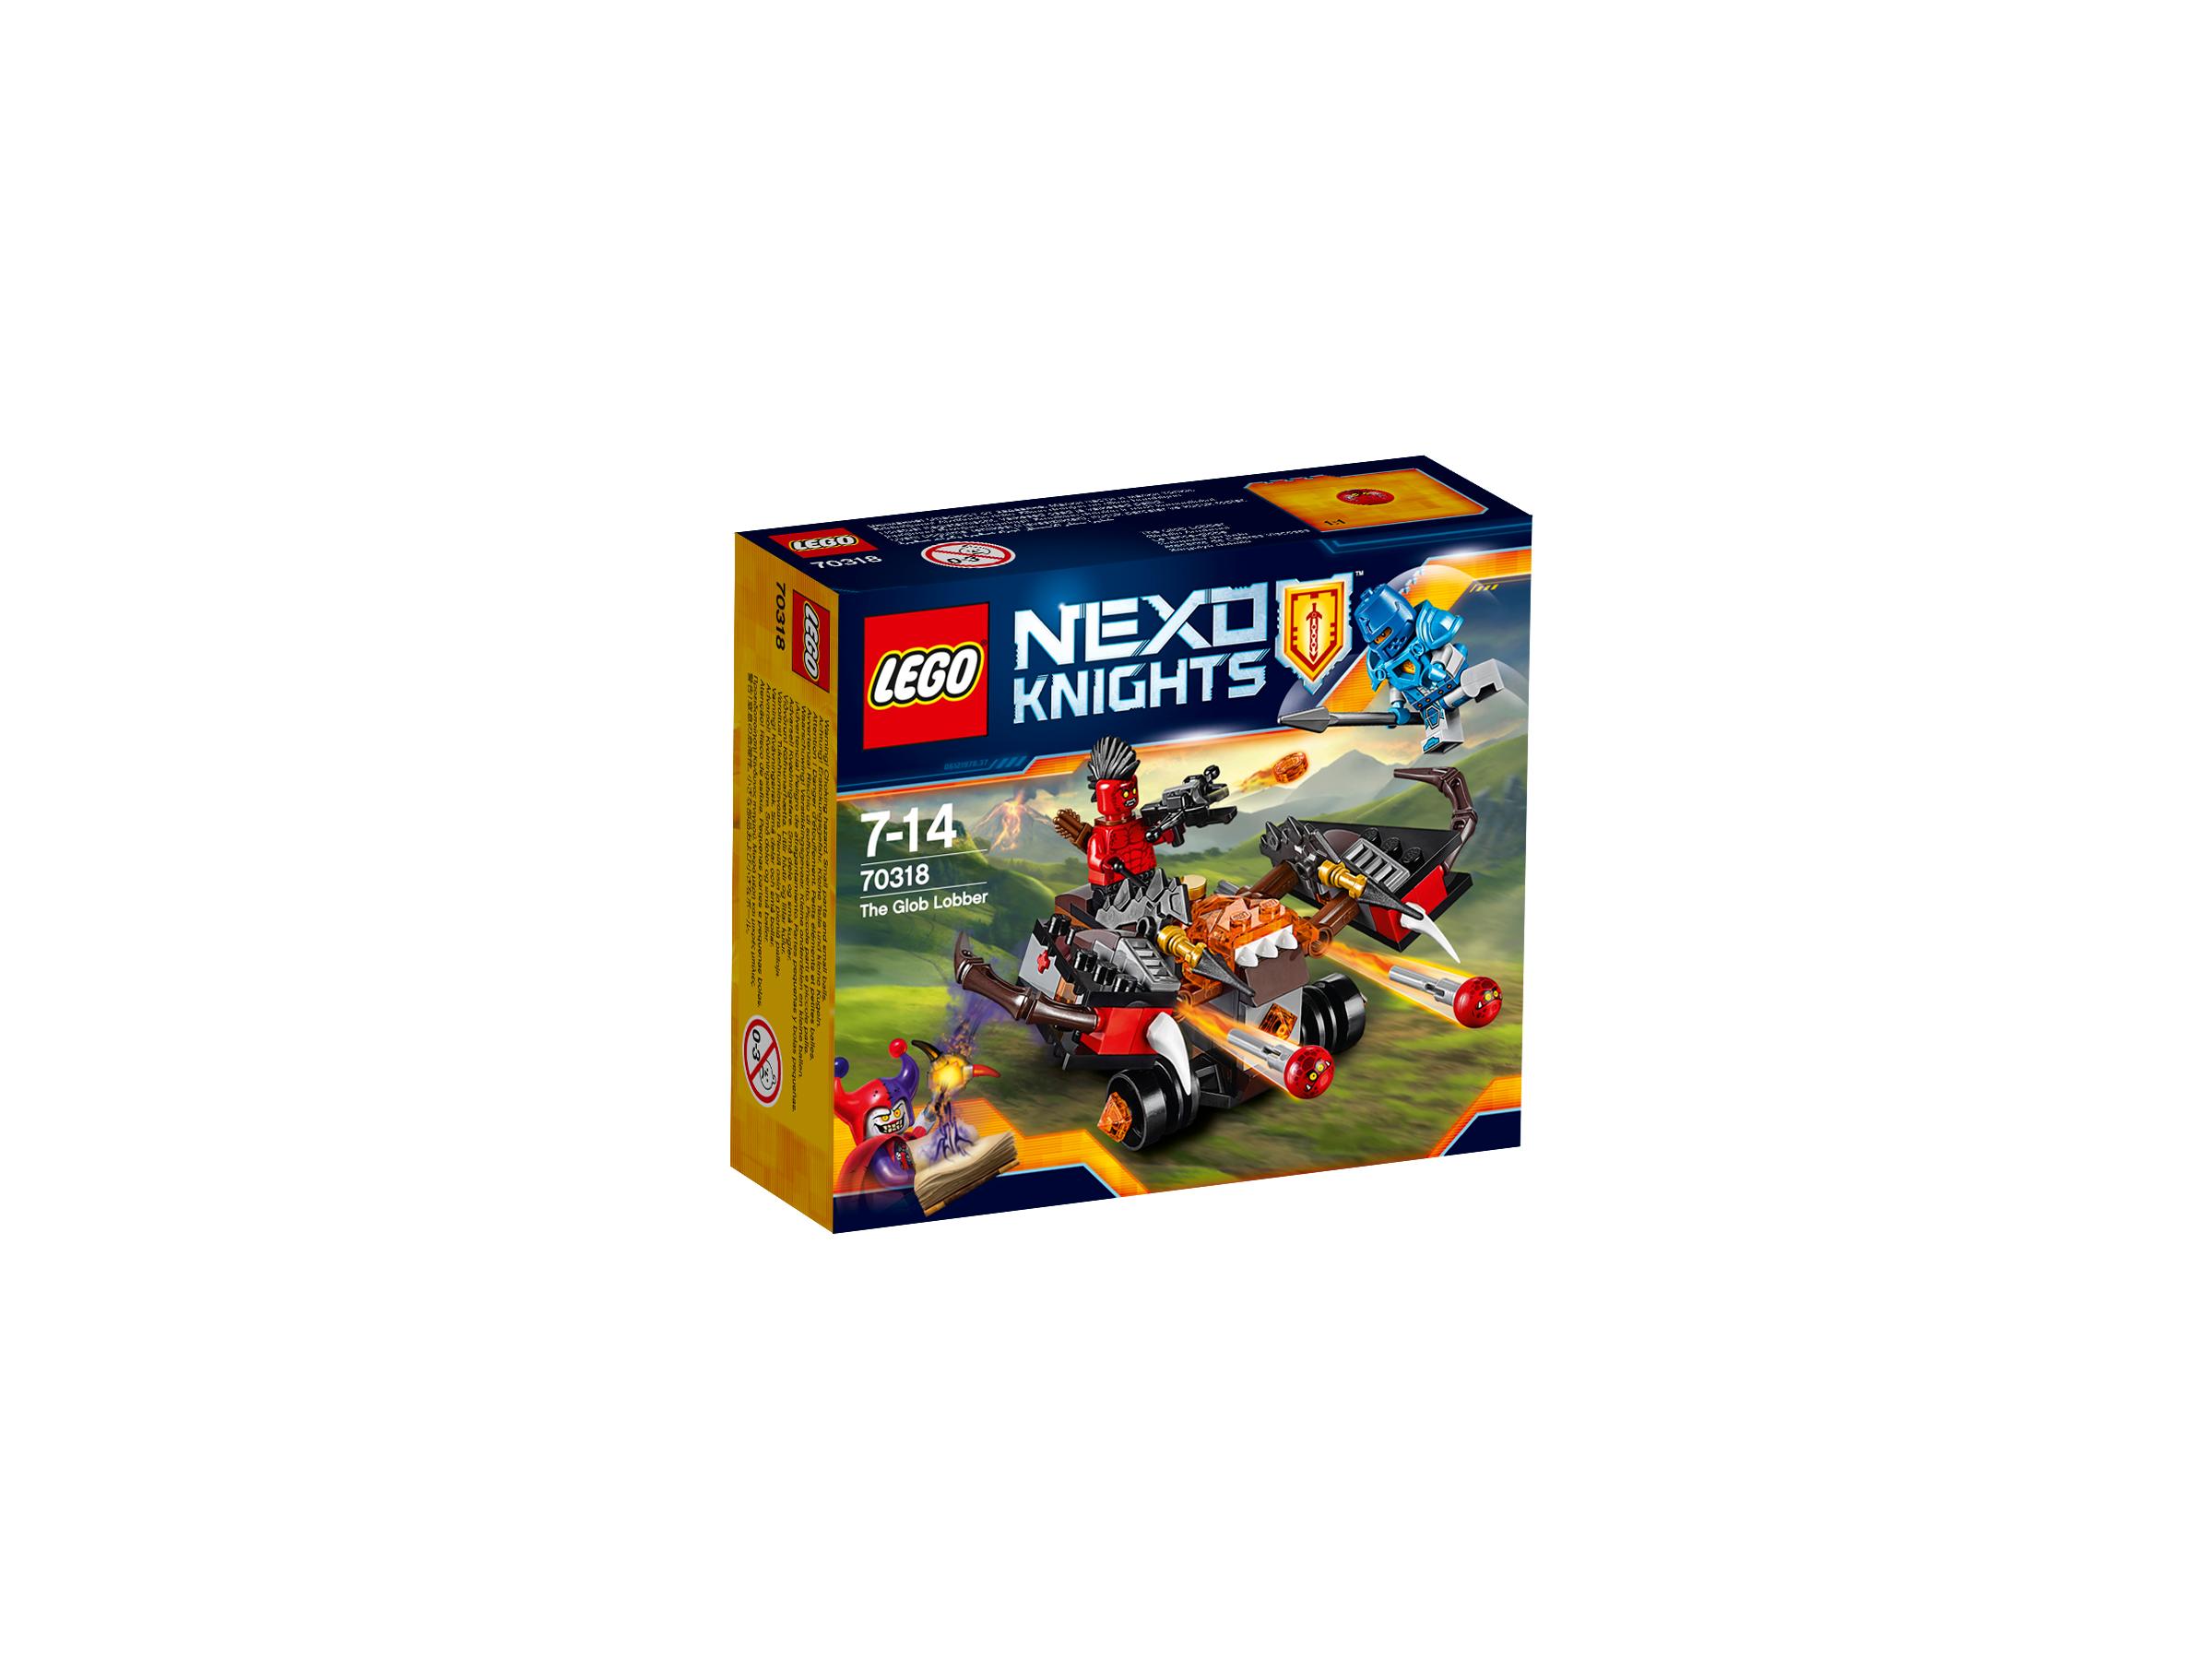 Lego City Julekalender Tilbud Audi A3 Leasing Tilbud